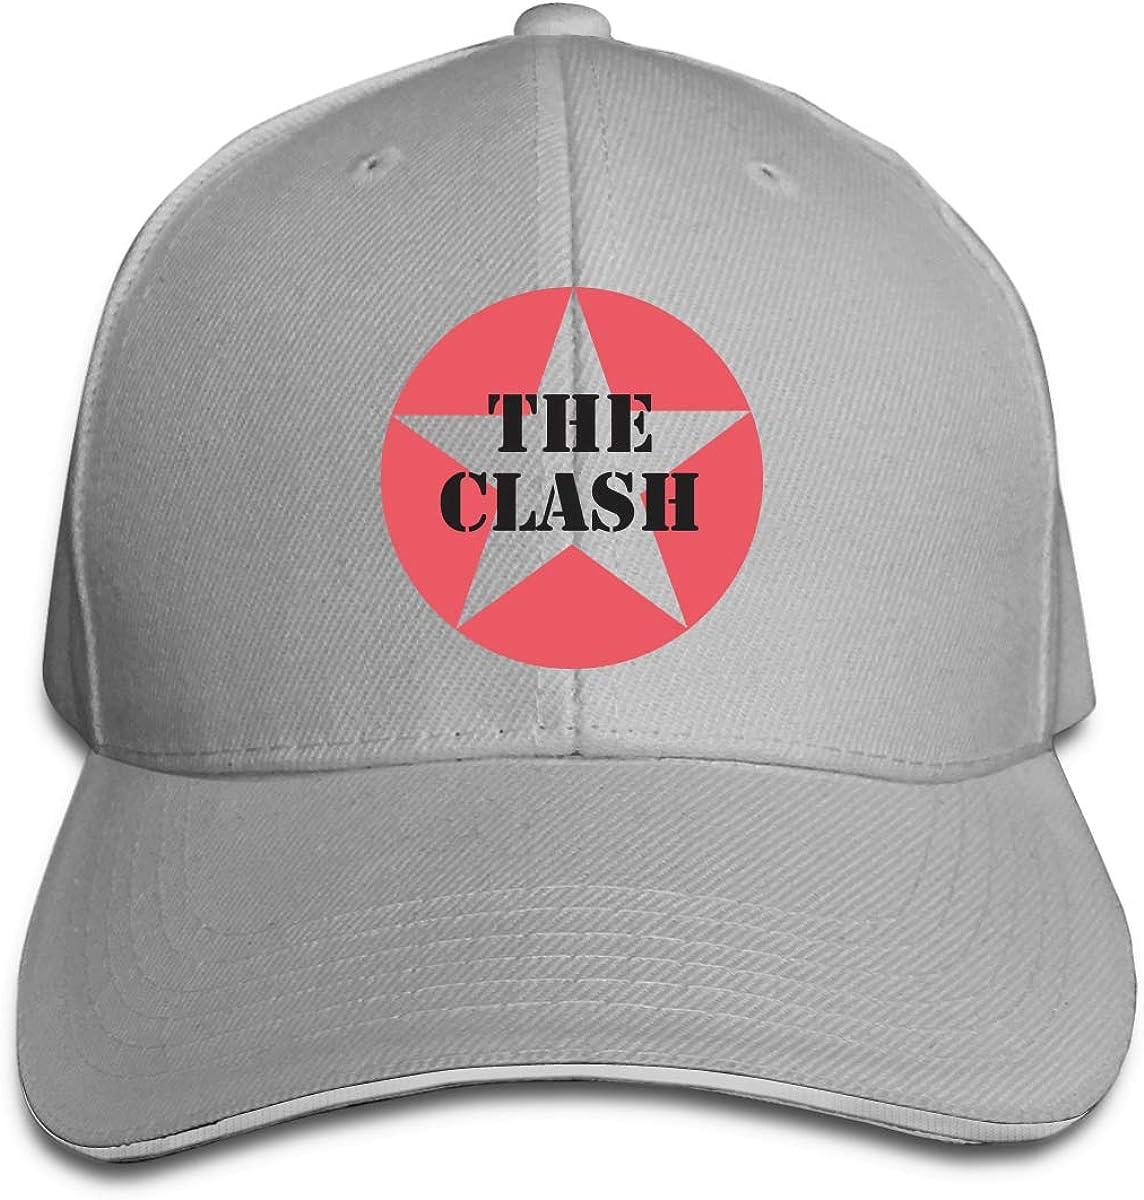 The Clash Fashion Sandwich Baseball Cap Adjustable Curved Visor Hat